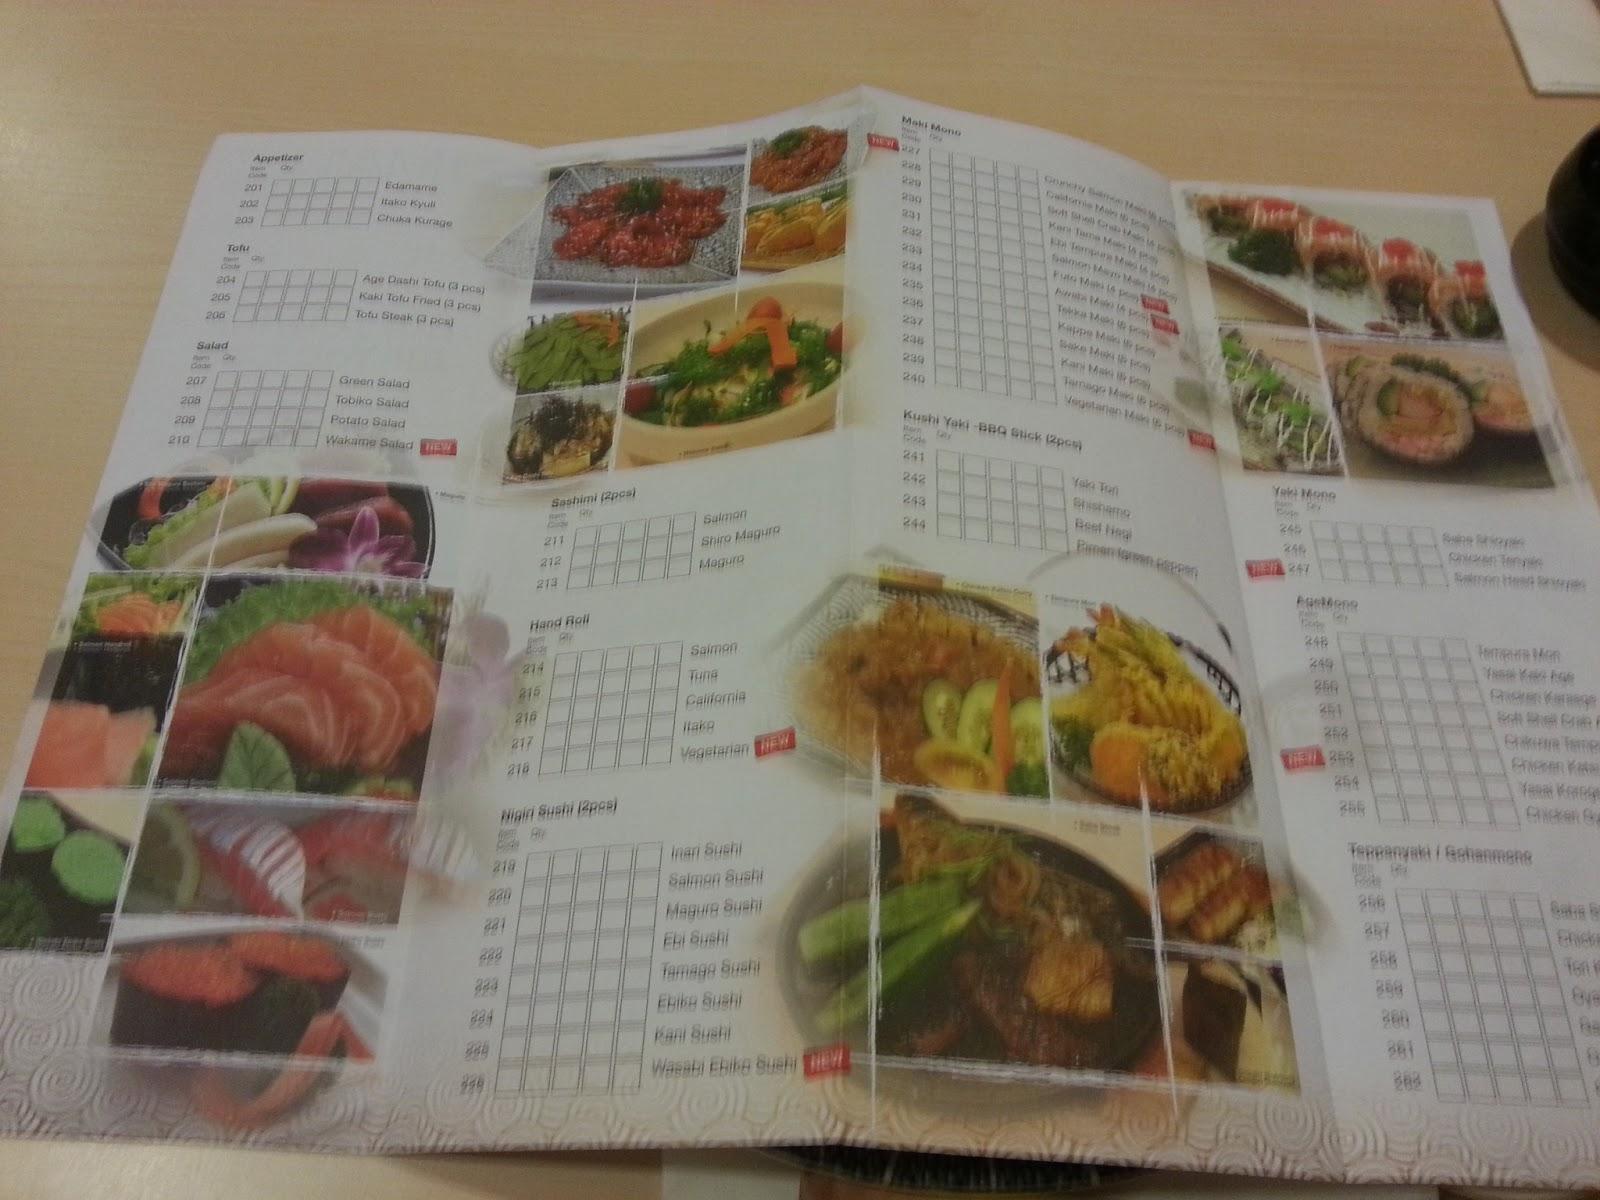 Japanese restaurant menu items for Asian cuisine catering